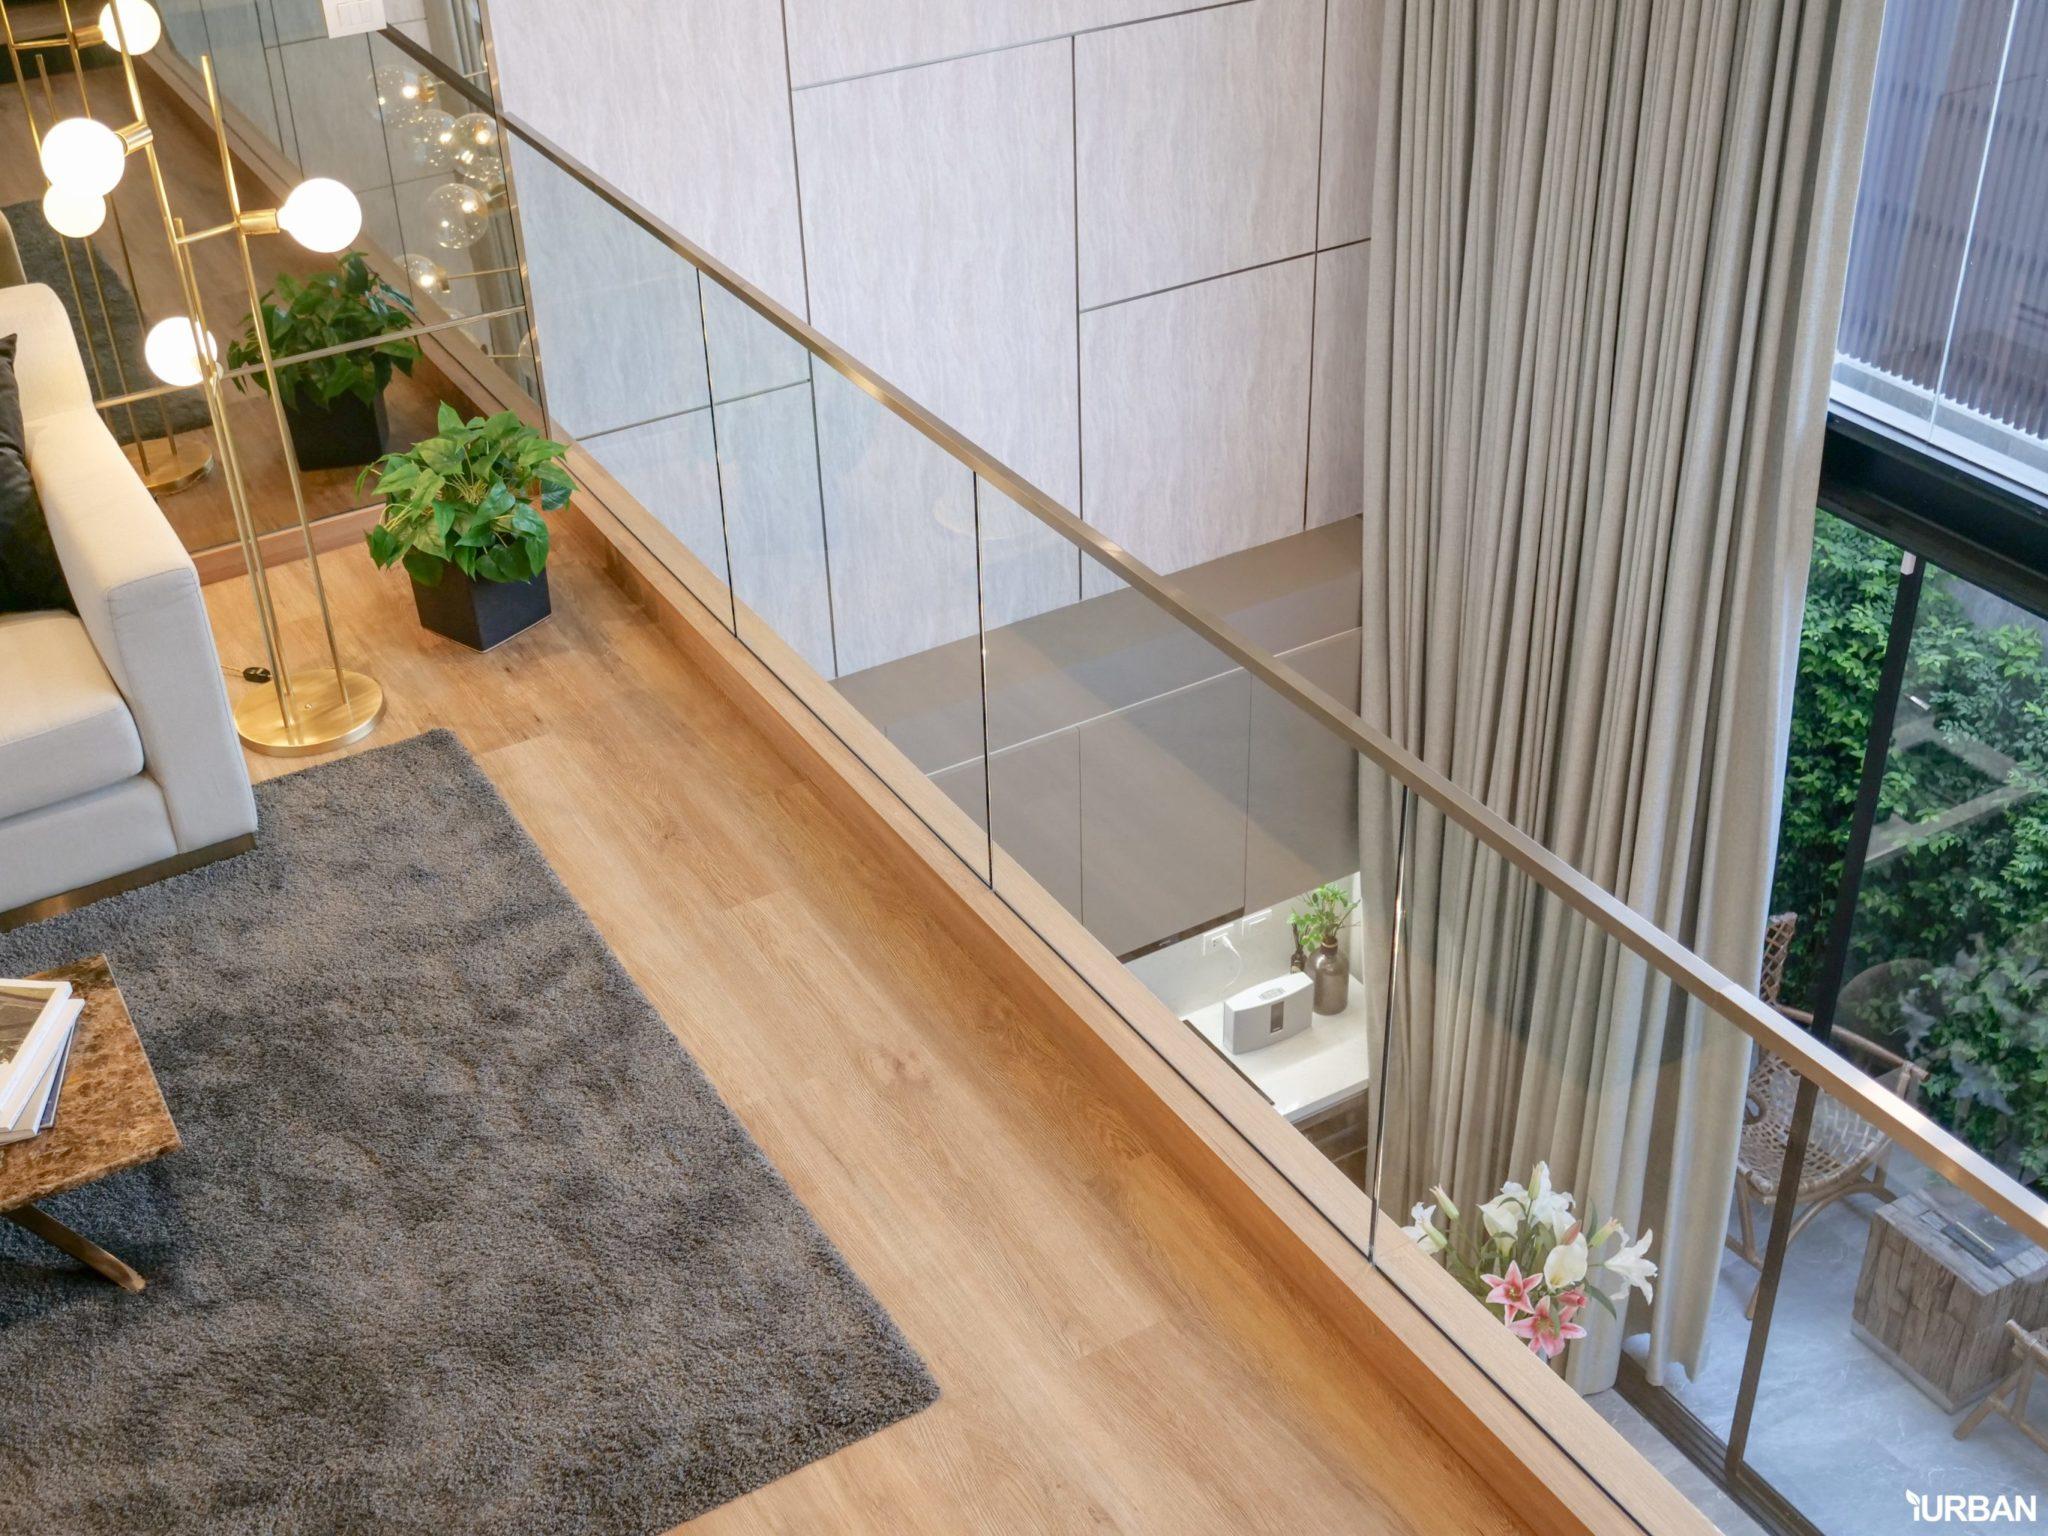 AIRES RAMA9 รีวิว Luxury Townhome 3.5 ชั้น + Rooftop ออกแบบสวย ย่านพระราม9 (ใกล้ รพ.สมิติเวช) 44 - AIRES